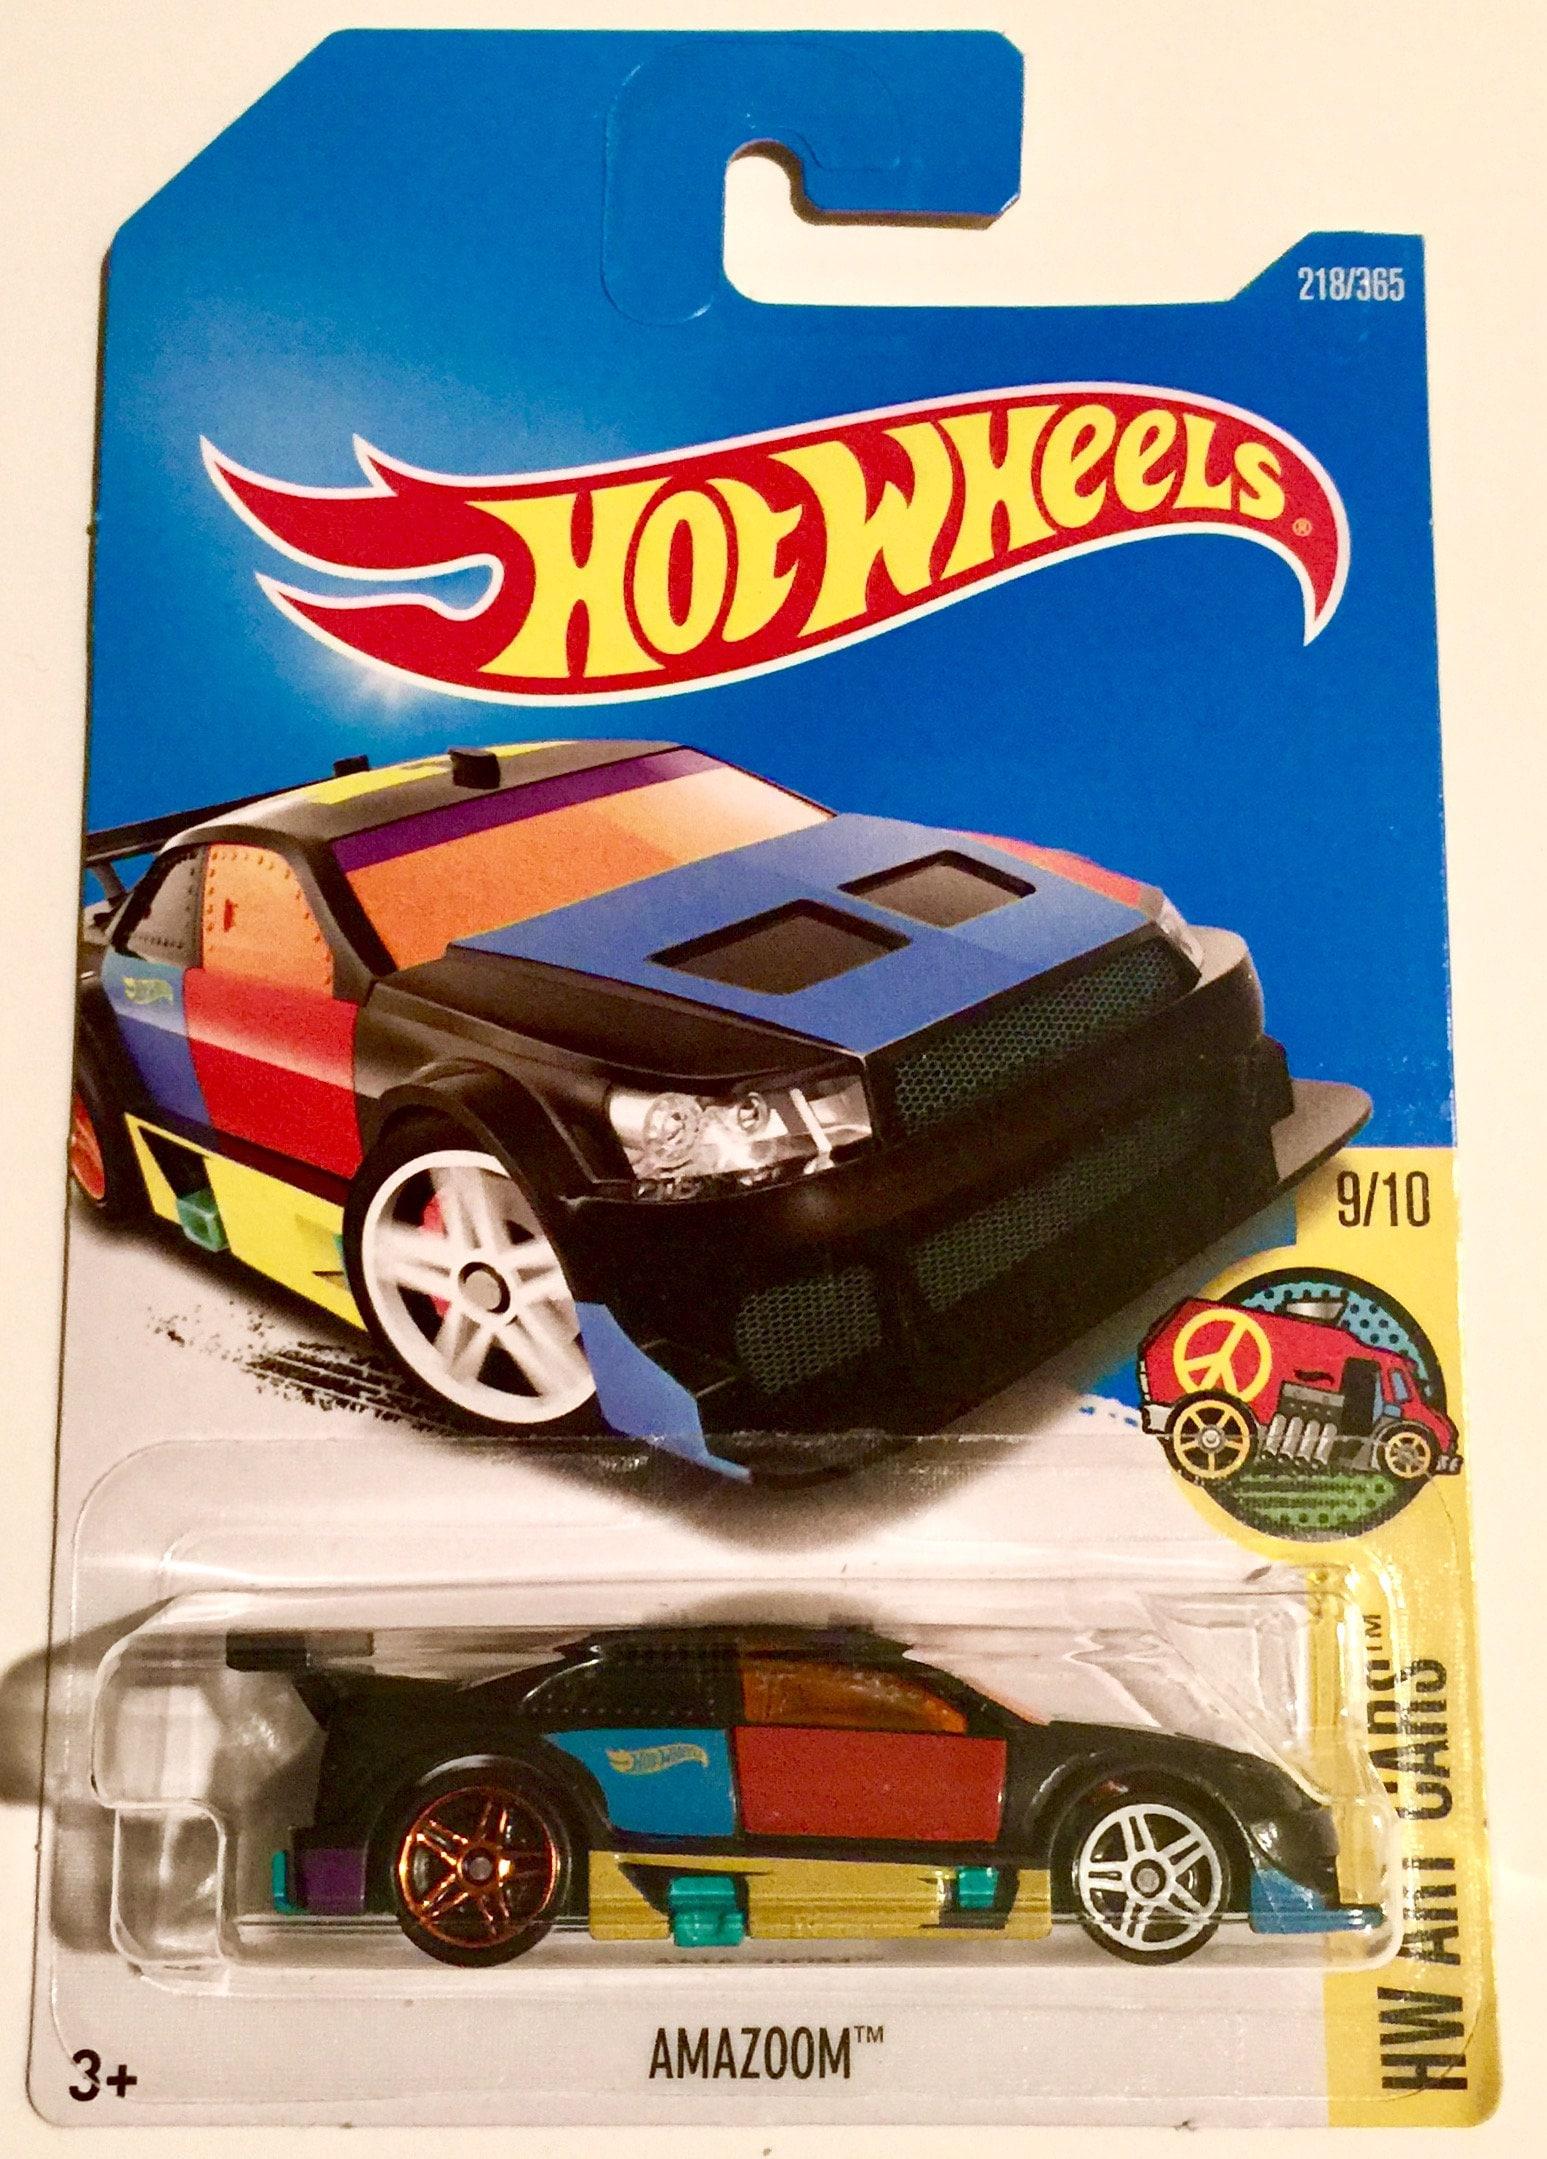 Hot Wheels Amazoom Hw Art Cars 218 365 Very Rare Free Etsy Lamborghini Estoque 50